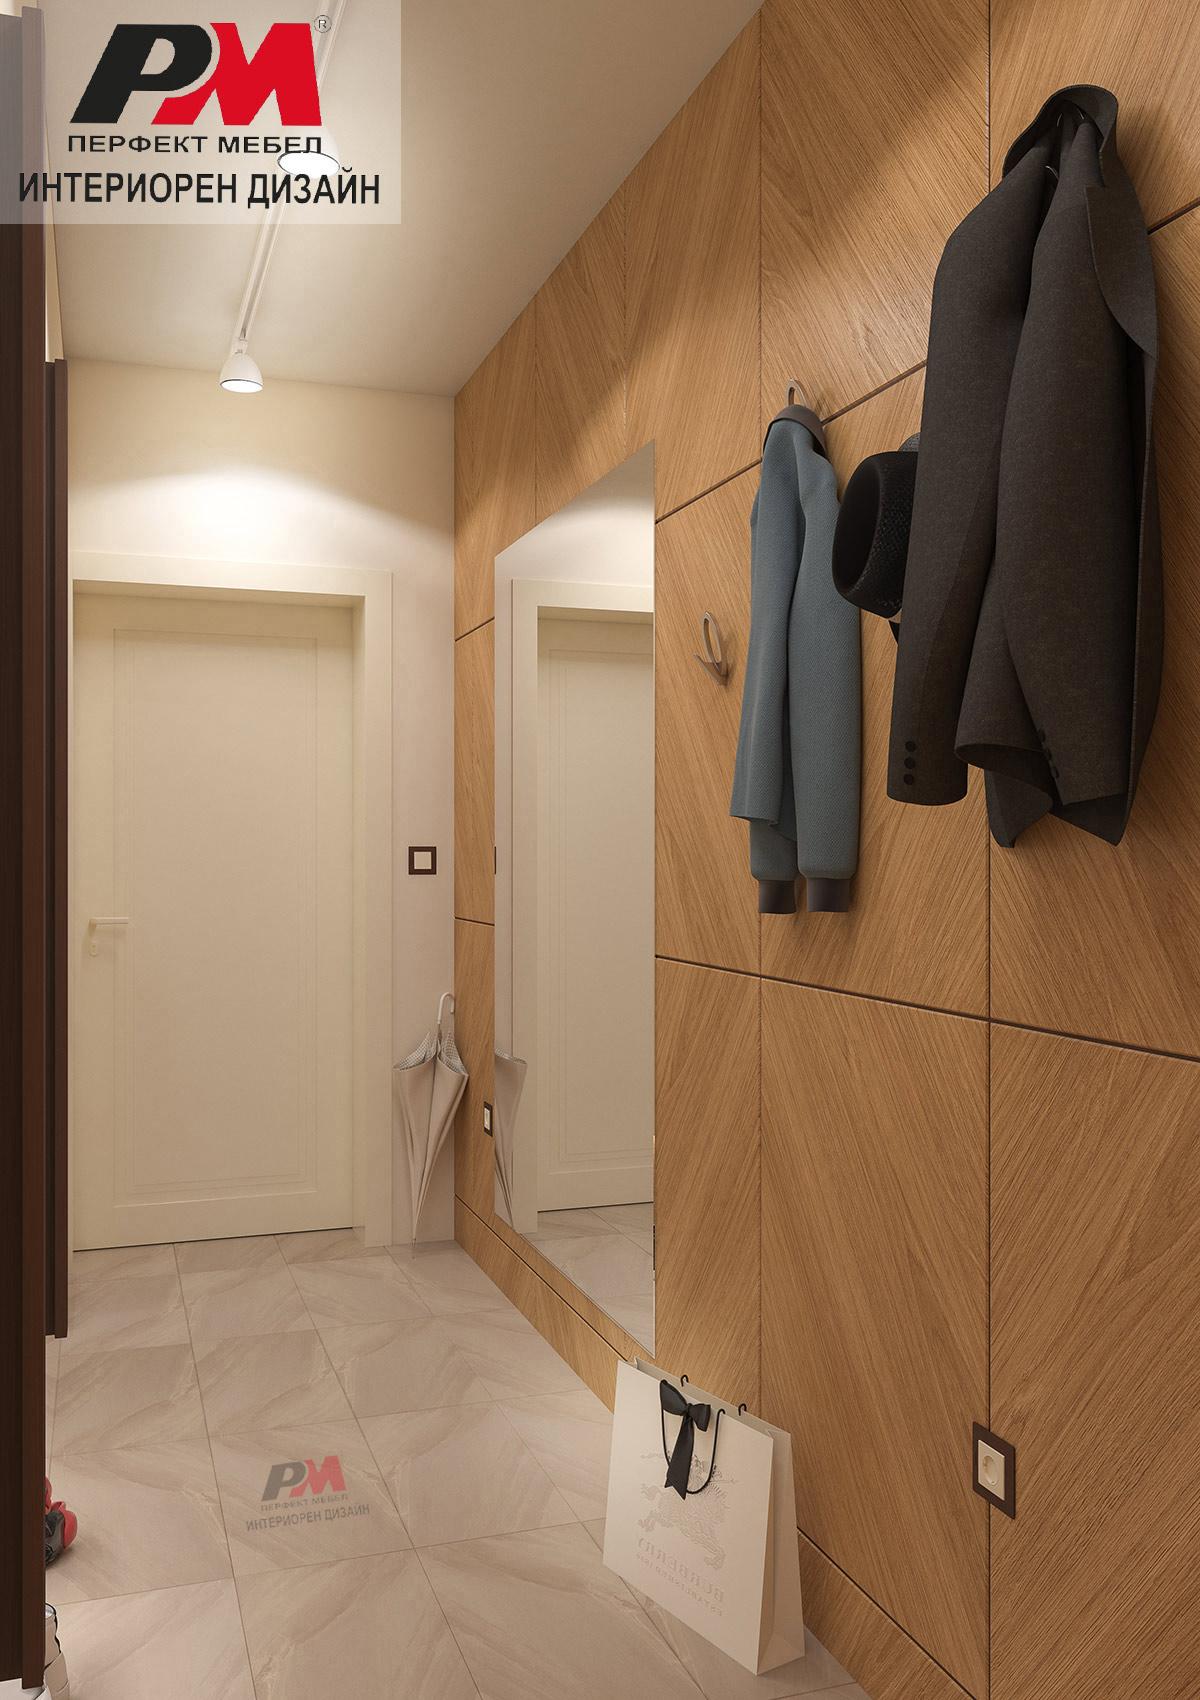 Елегантно коридорно пространство, посрещащо гости